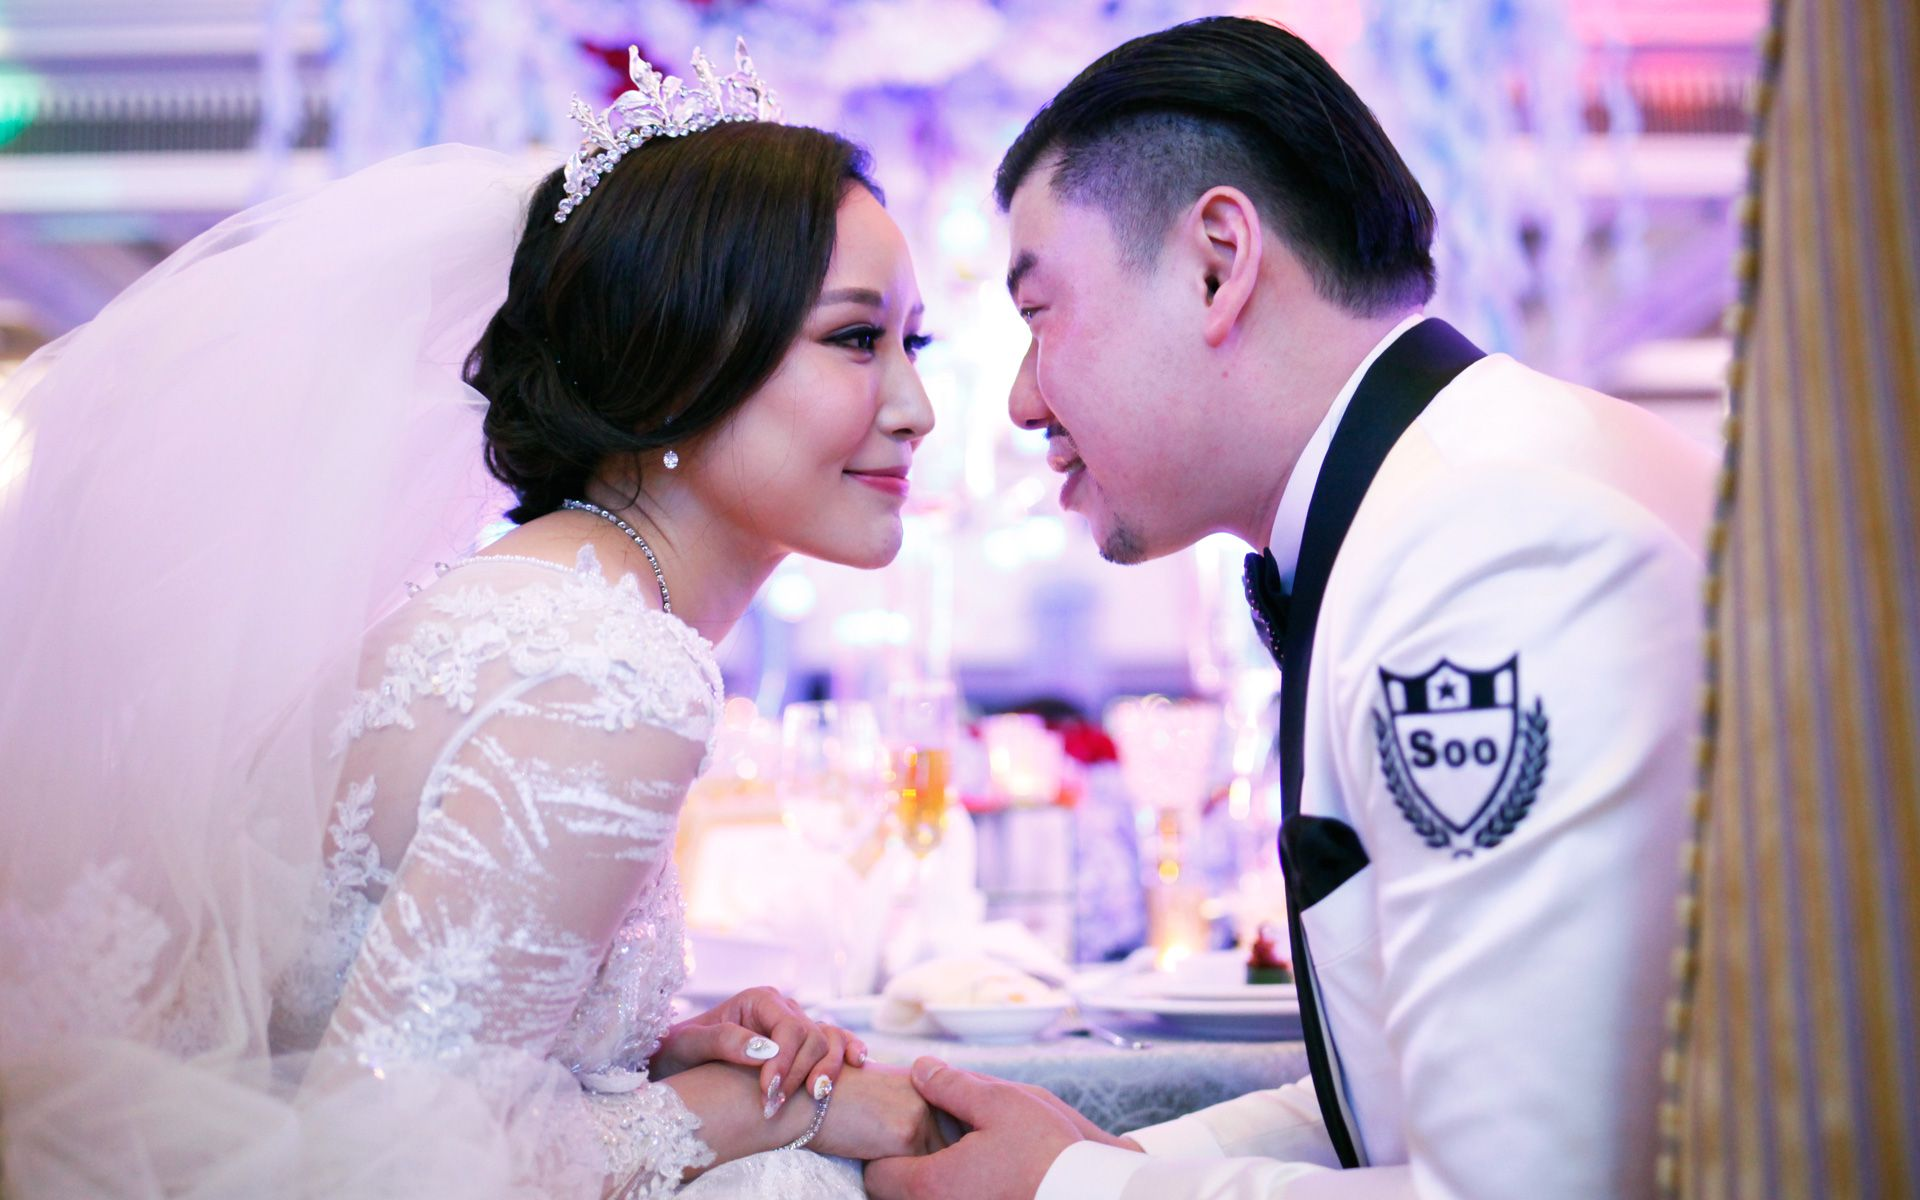 Tunku ismail wedding cakes